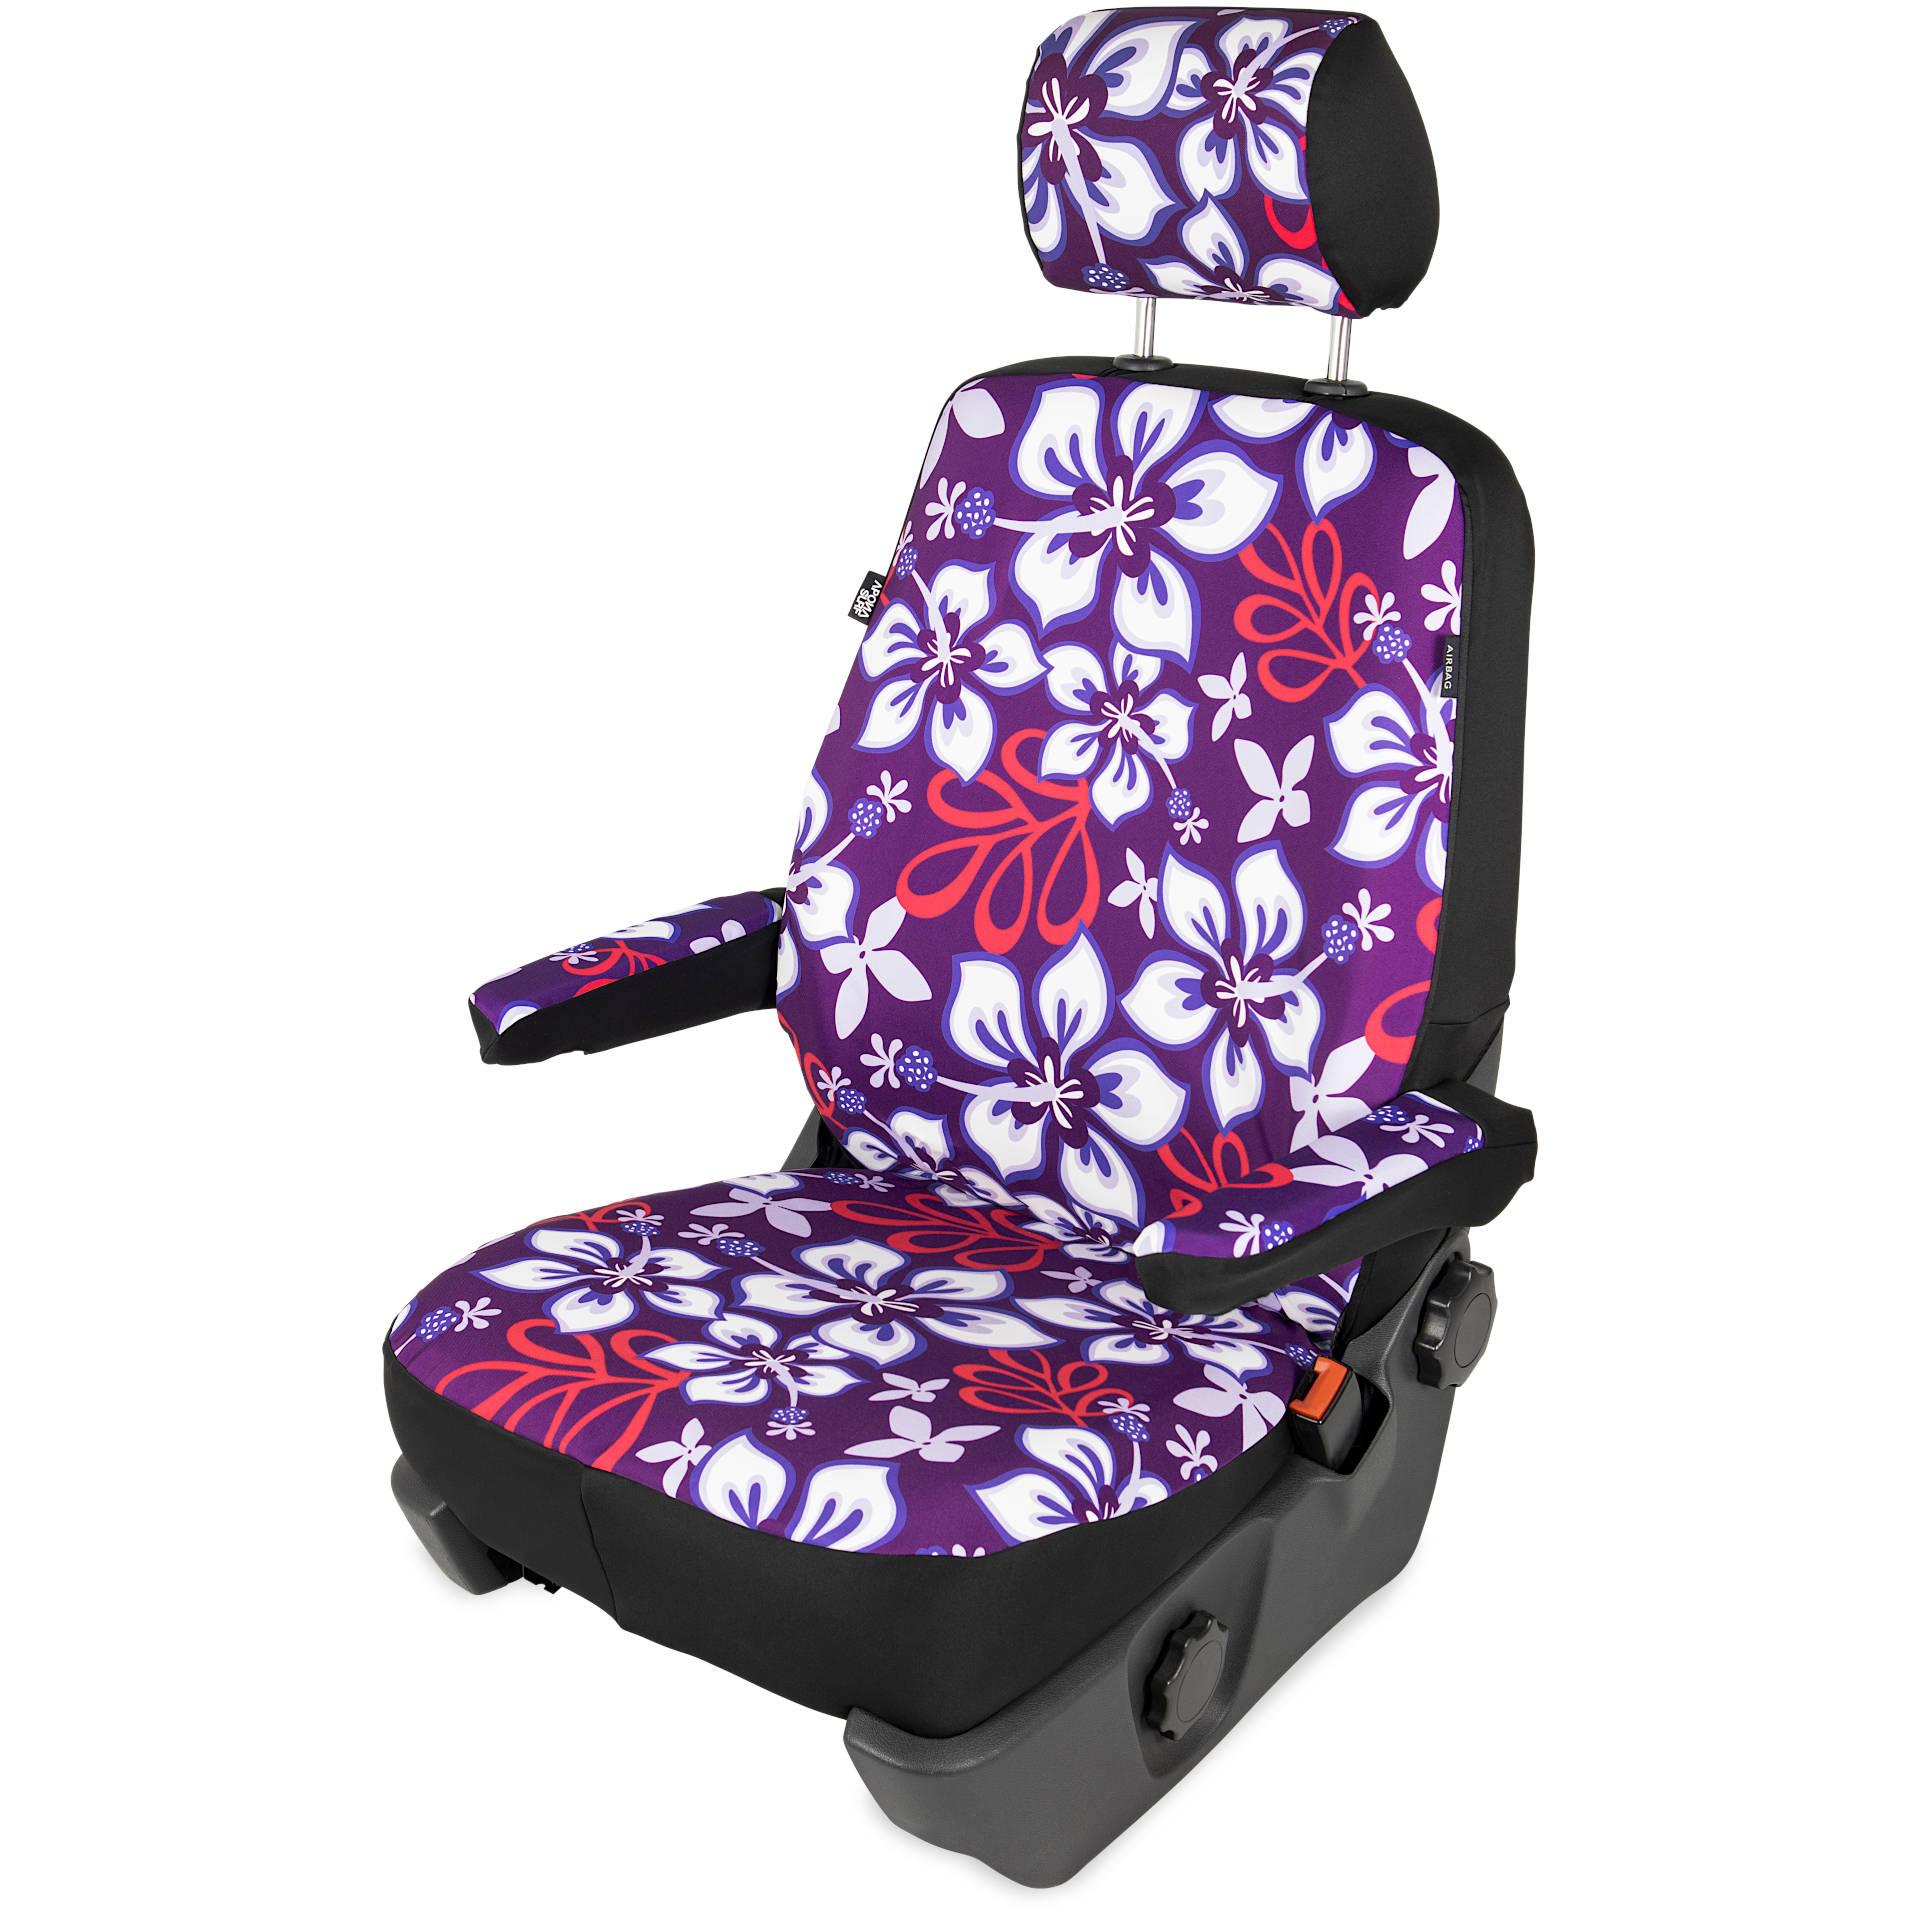 Sitzbezüge Schonbezüge SET PA VW Crafter Stoff